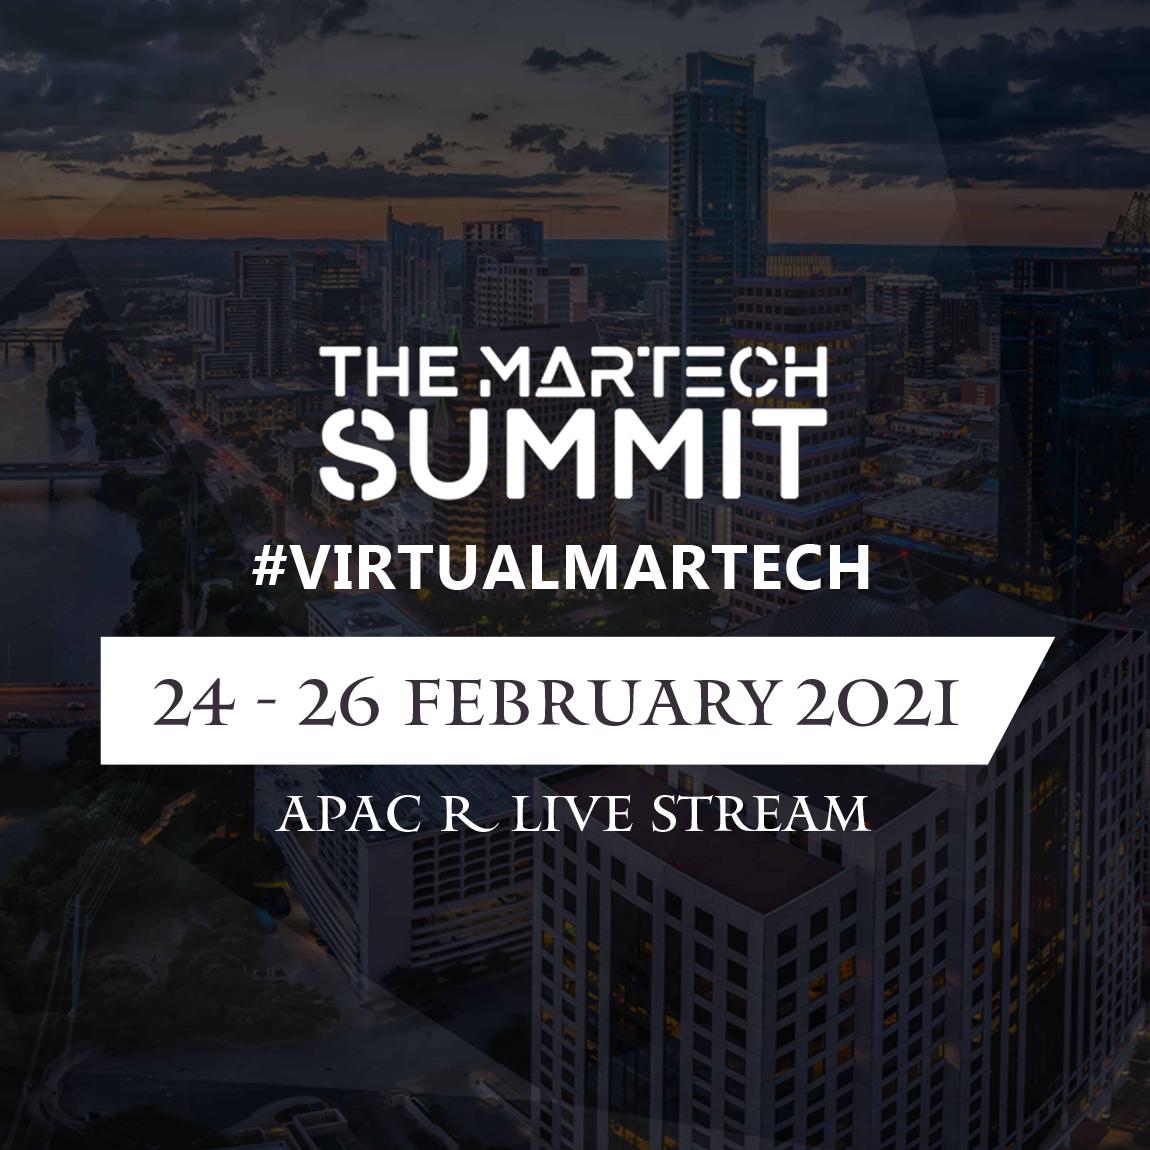 The MarTech Summit: Virtual APAC